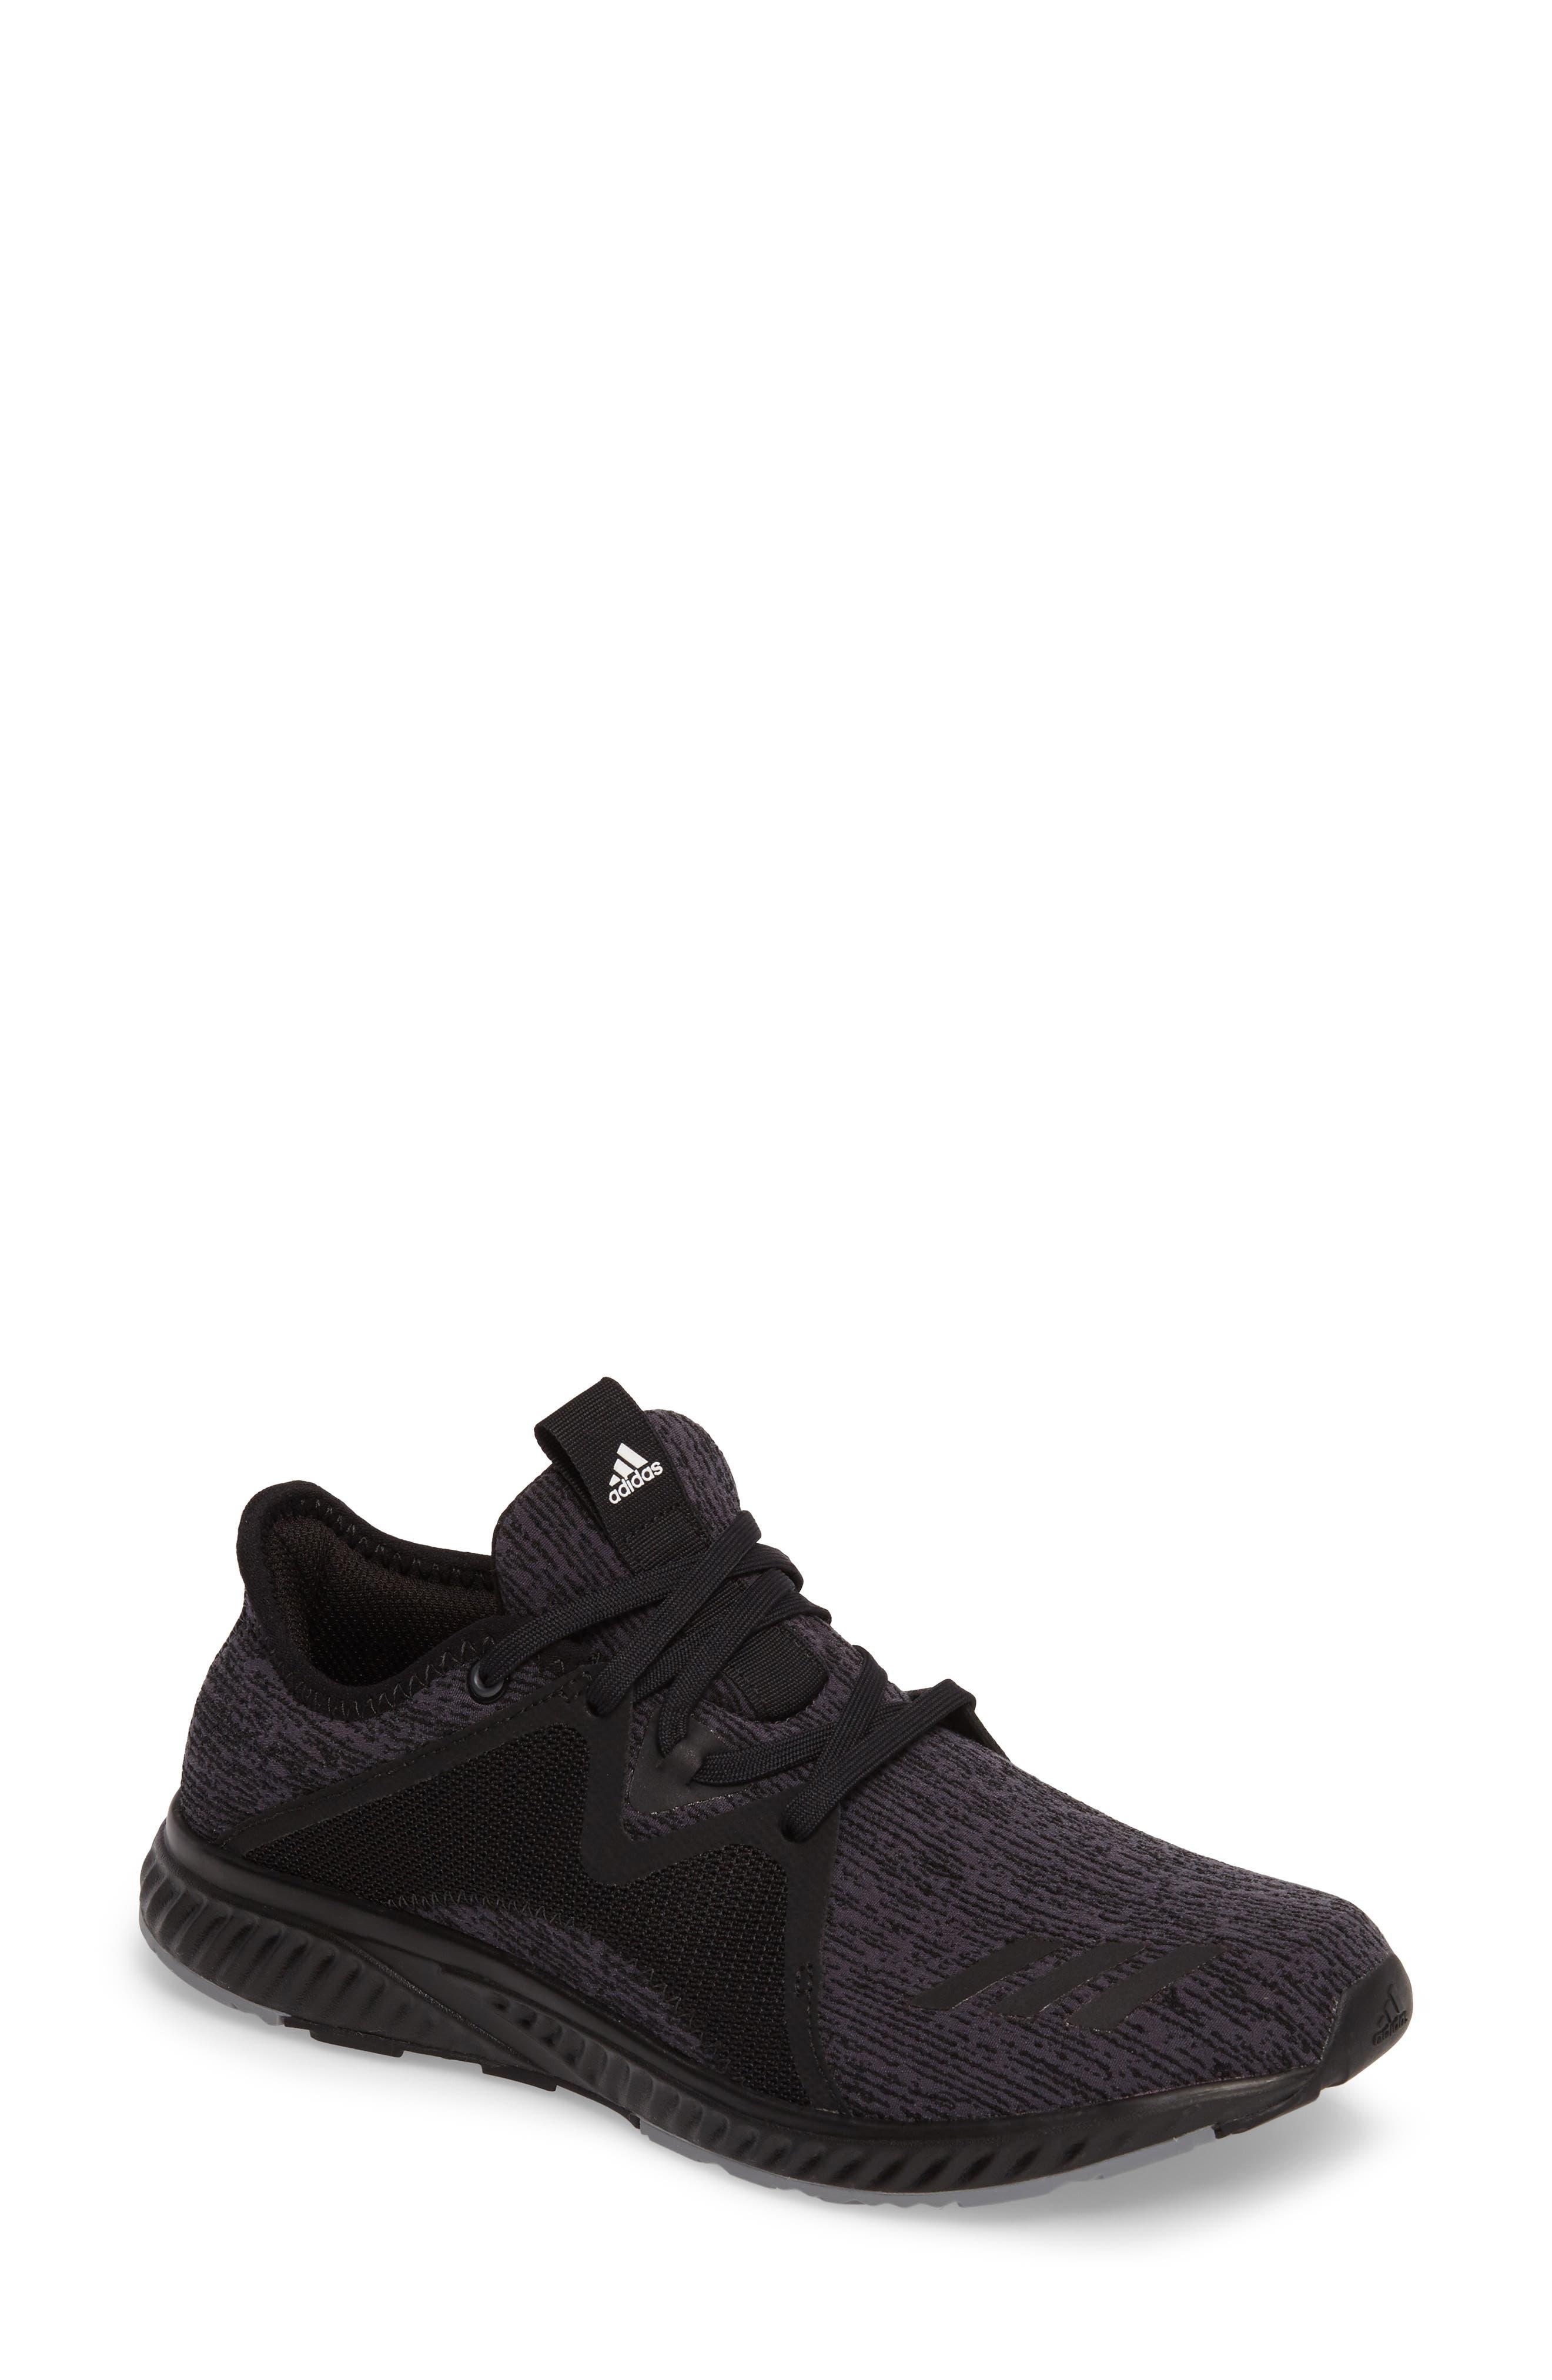 Alternate Image 1 Selected - adidas Edge Lux 2.0 Running Shoe (Women)